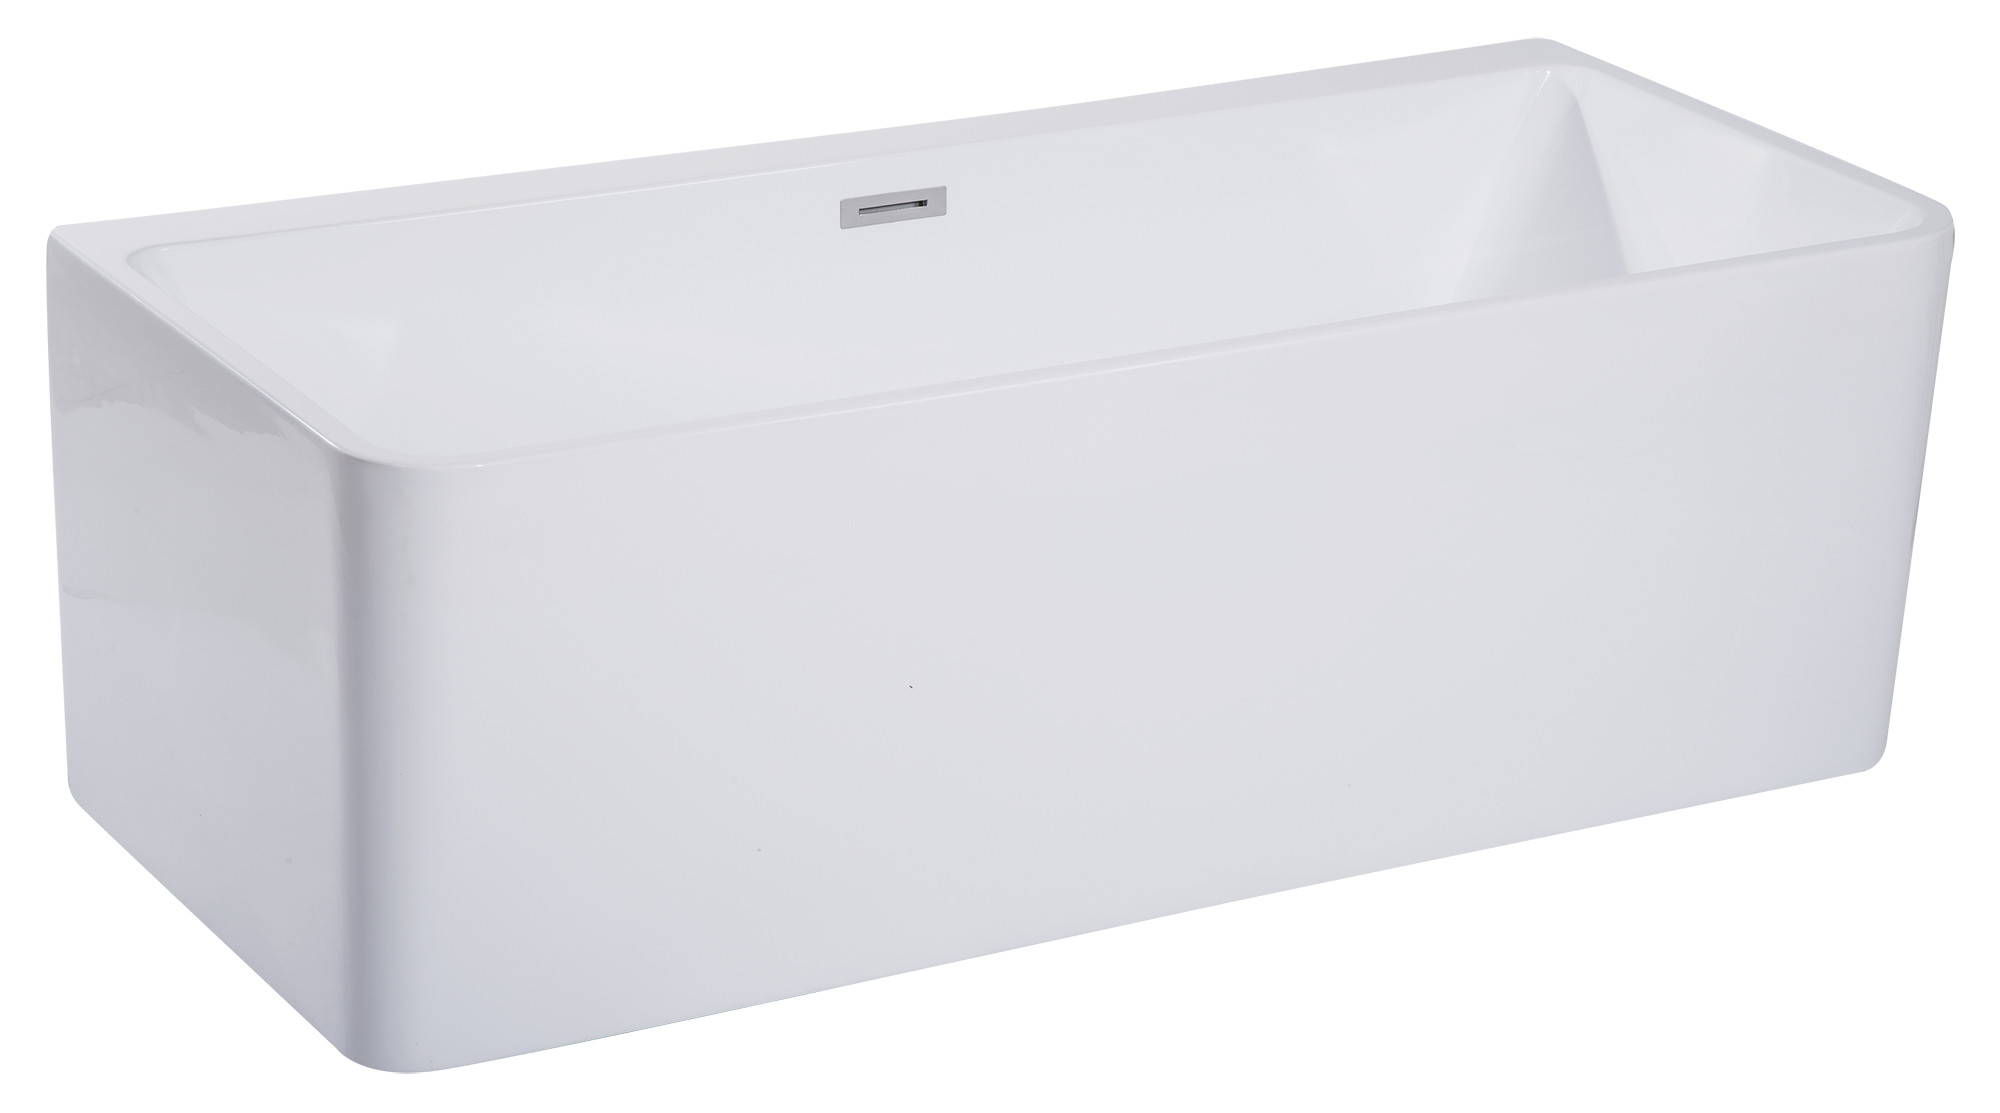 ALFI brand AB8859 67 Inch White Rectangular Acrylic Free Standing Soaking Bathtub